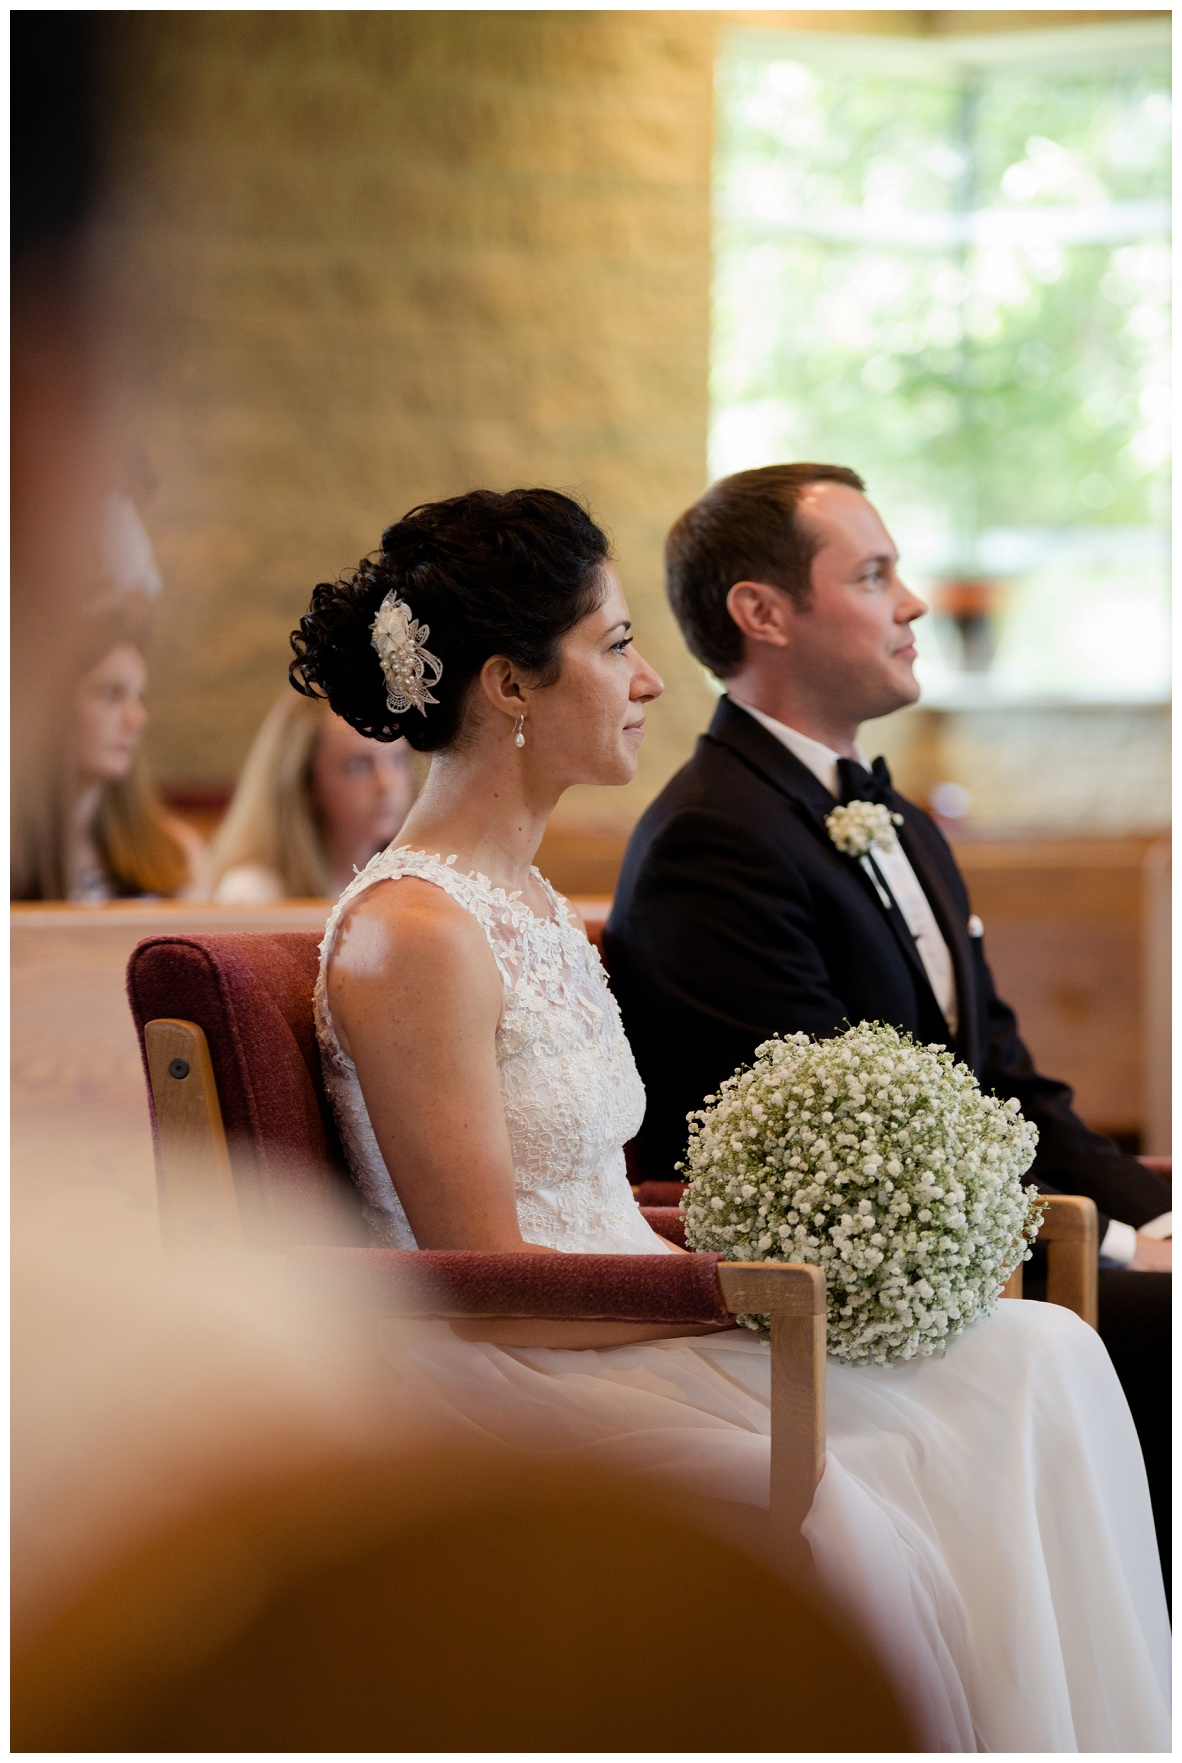 The Wedding of Danielle and Matt_0027.jpg